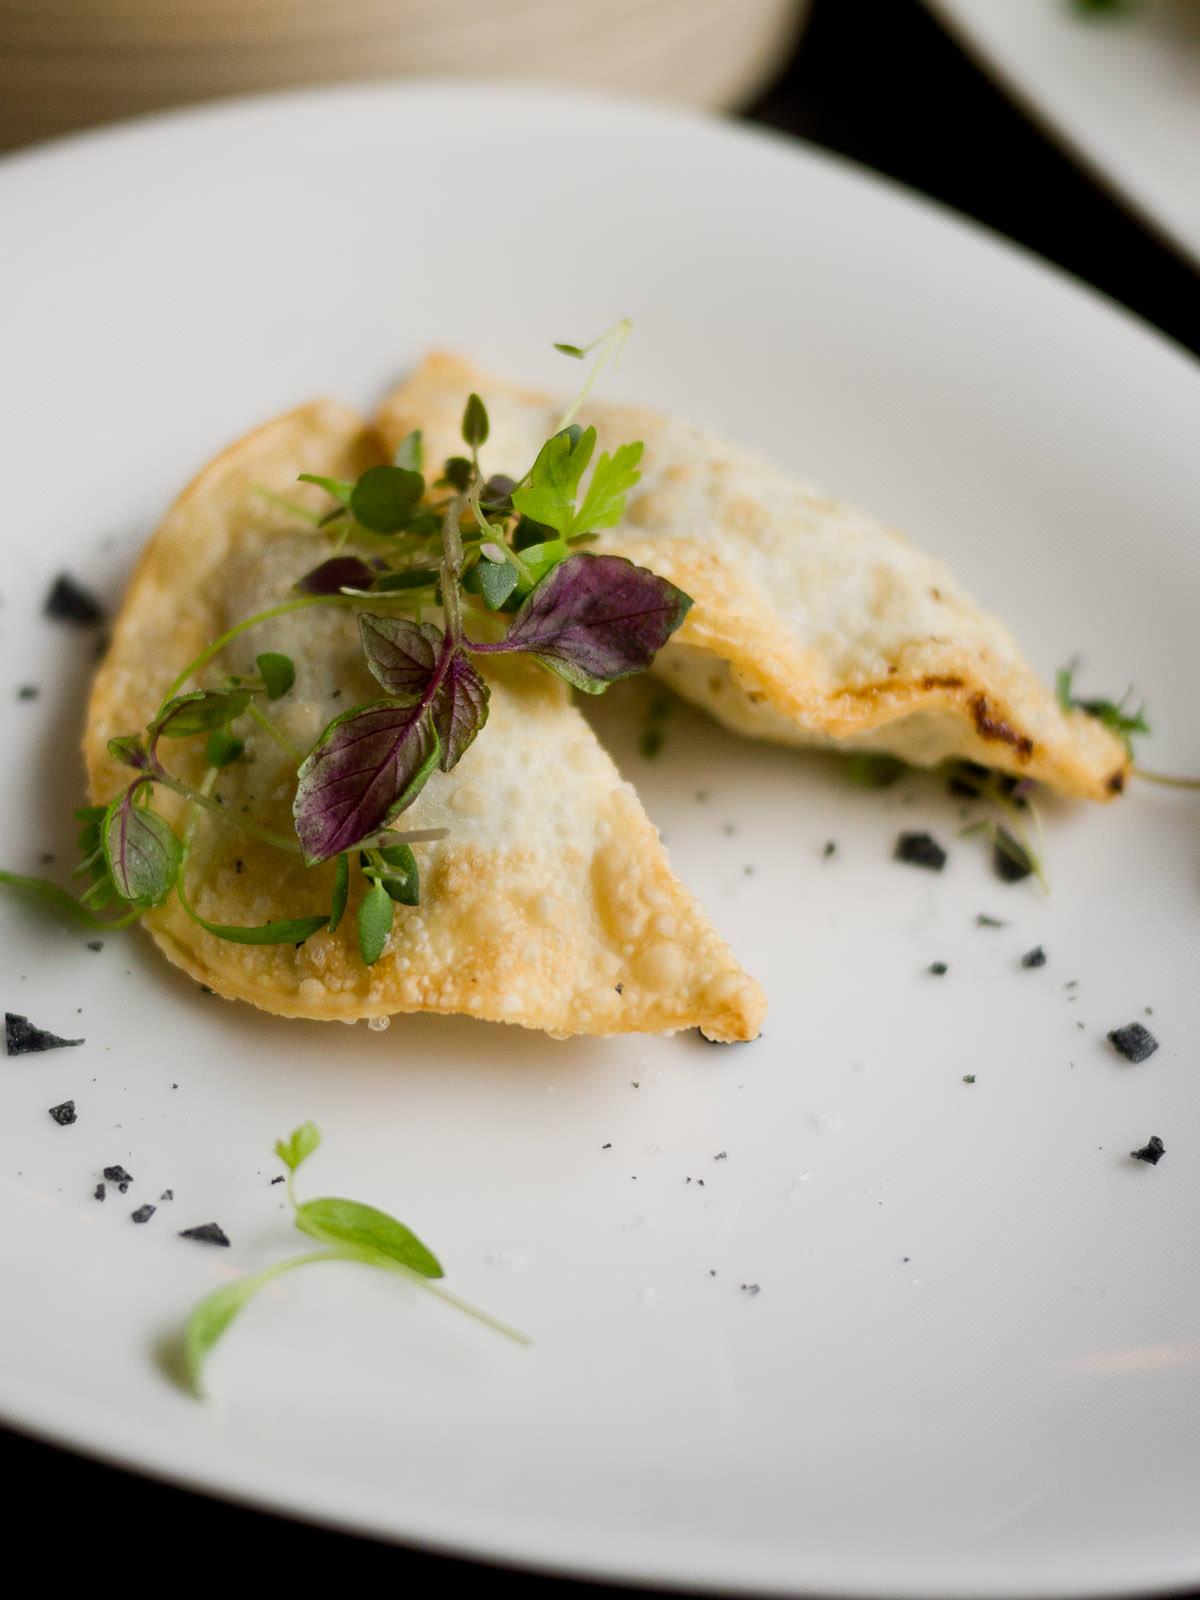 Confit champignon, white truffle, egg wonton